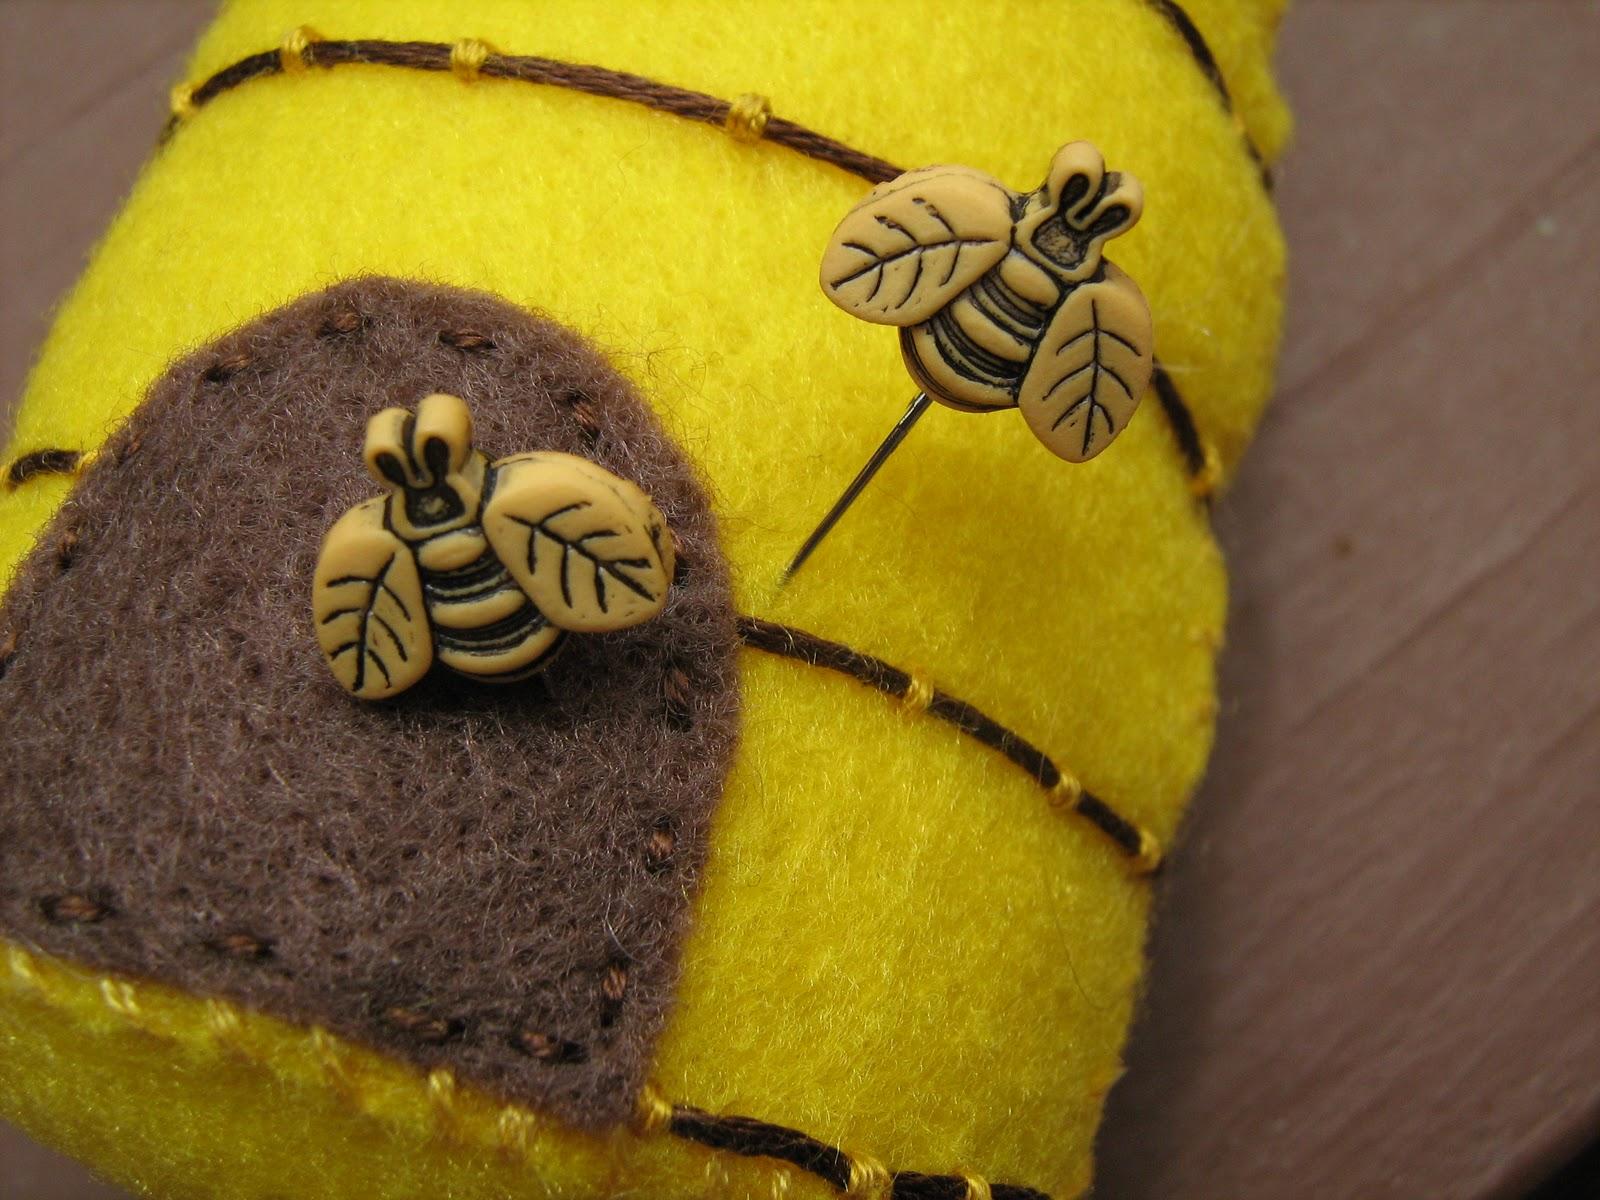 fowl single file a bee hive pincushion for grandma